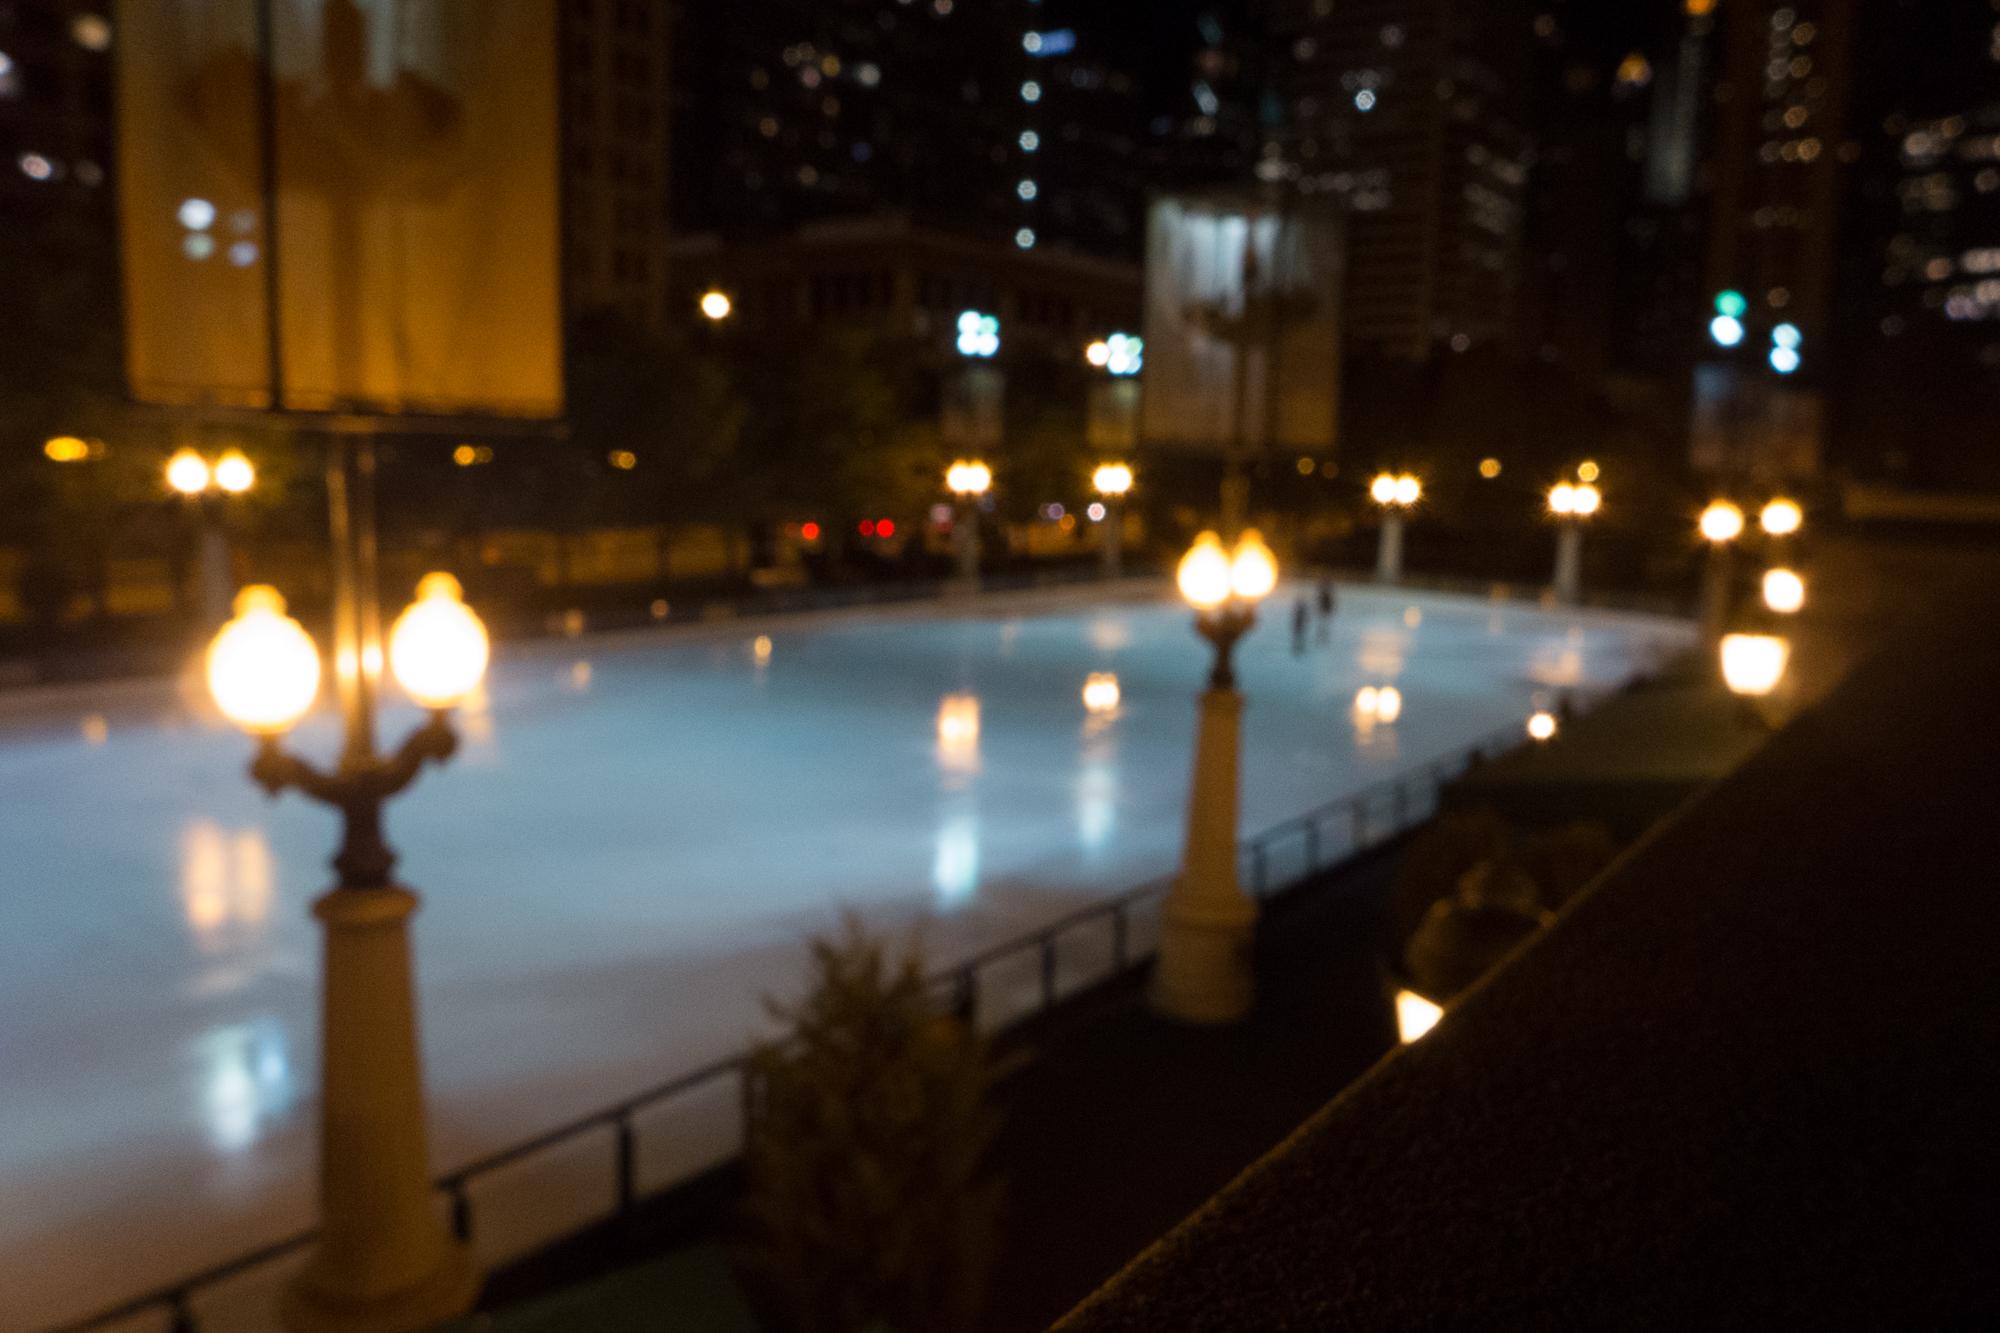 Night rink